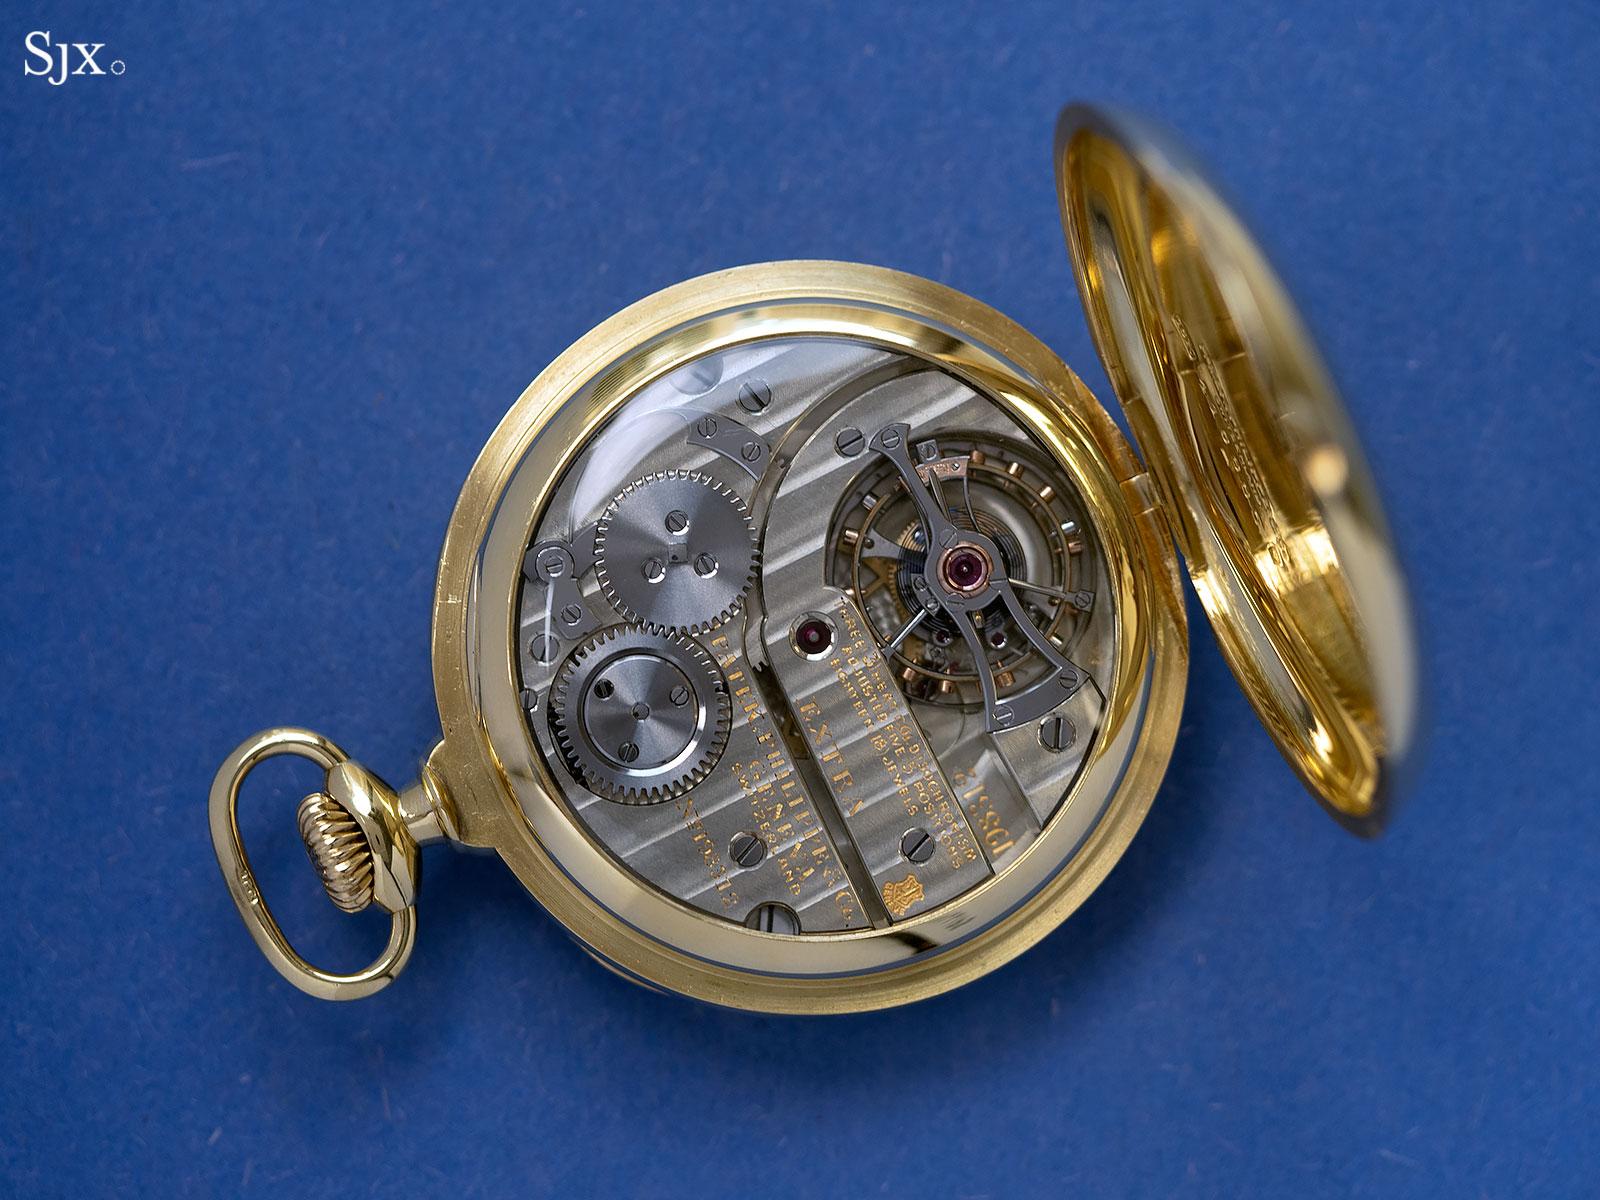 patek observatory tourbillon pocket watch 198312 6